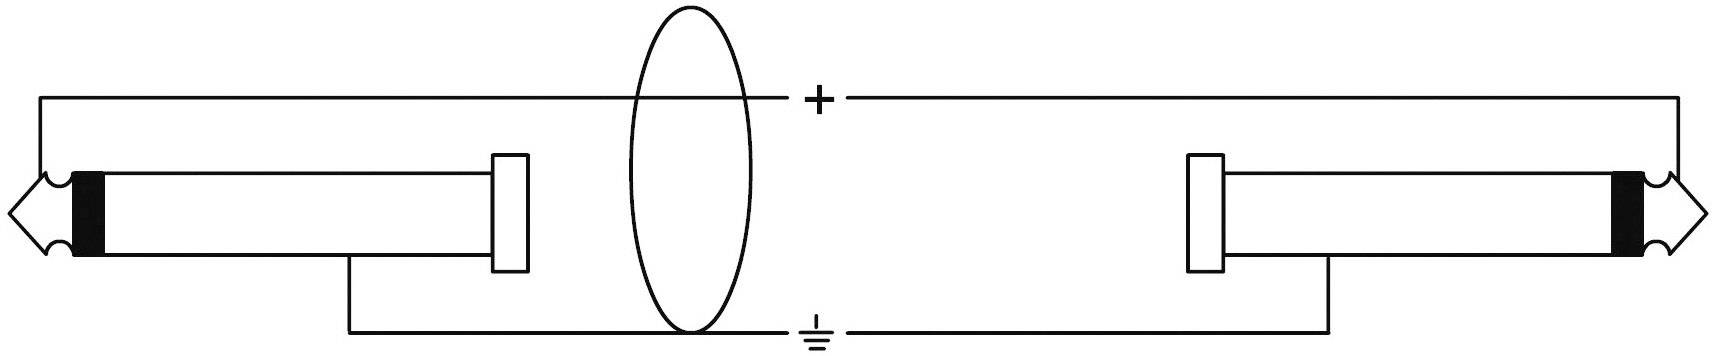 Kabel Cordial CPL 3 PP, [1x jack zástrčka 6,3 mm - 1x jack zástrčka 6,3 mm], 3 m, černá